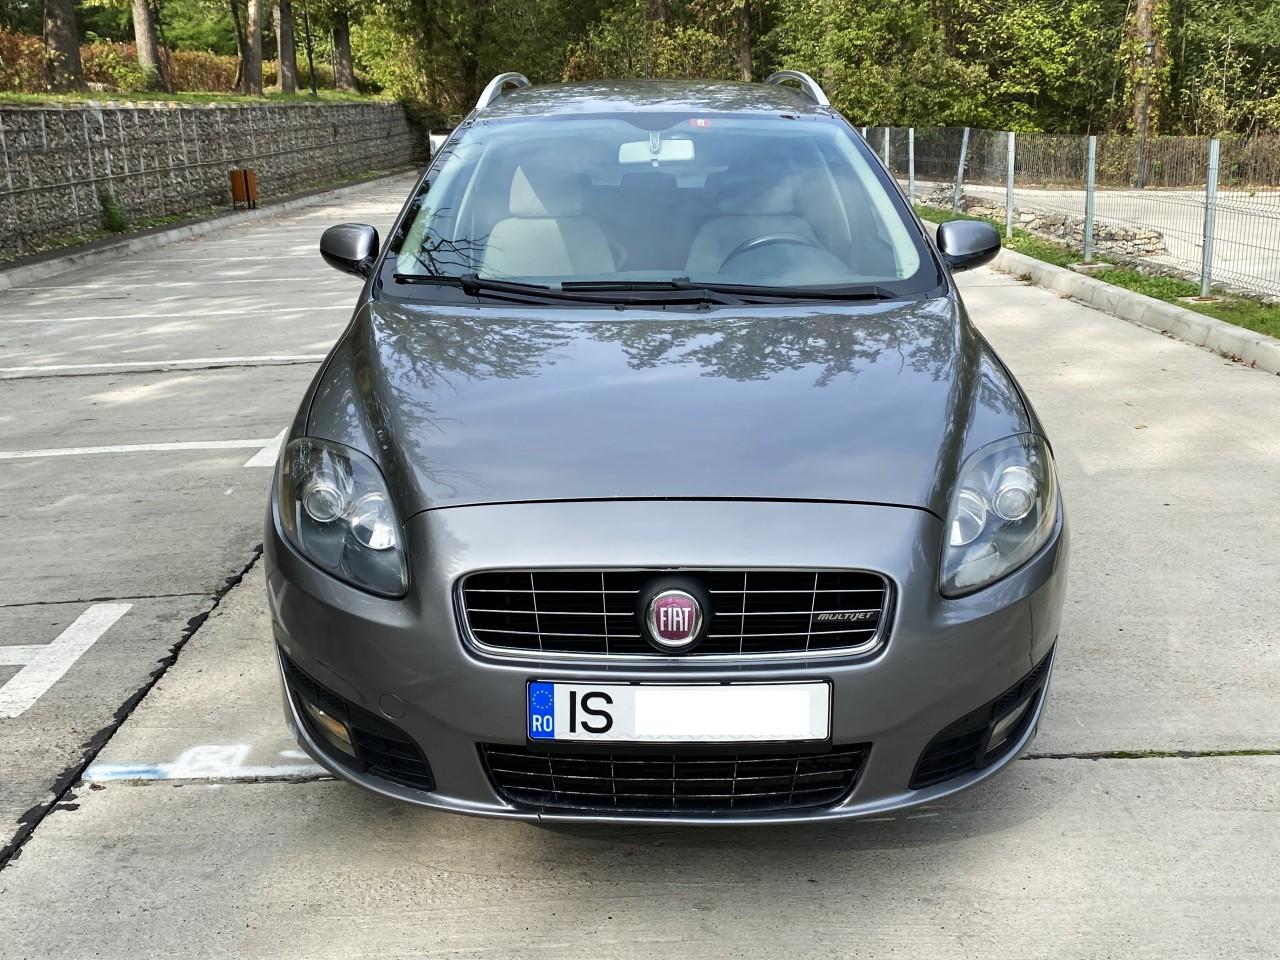 Fiat Croma 1,9 multijet 150 cp fab. 2009